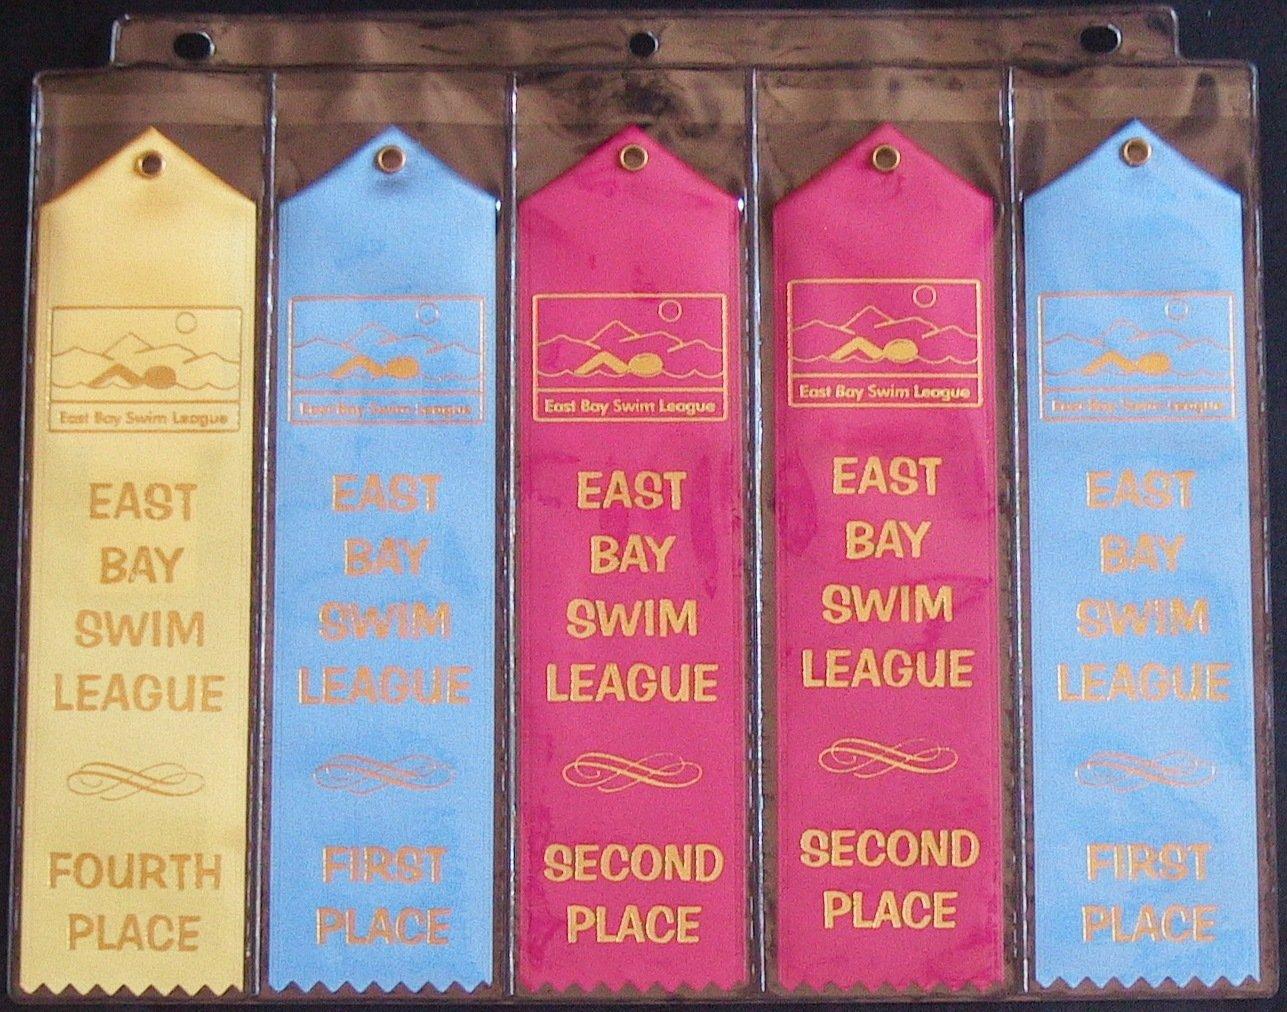 25 Swimming Ribbon Album PAGES Ribbons Organizer Storage Award Ribbon Holder Display Gift Swim Gymnastics Track and Field by Mercurydean